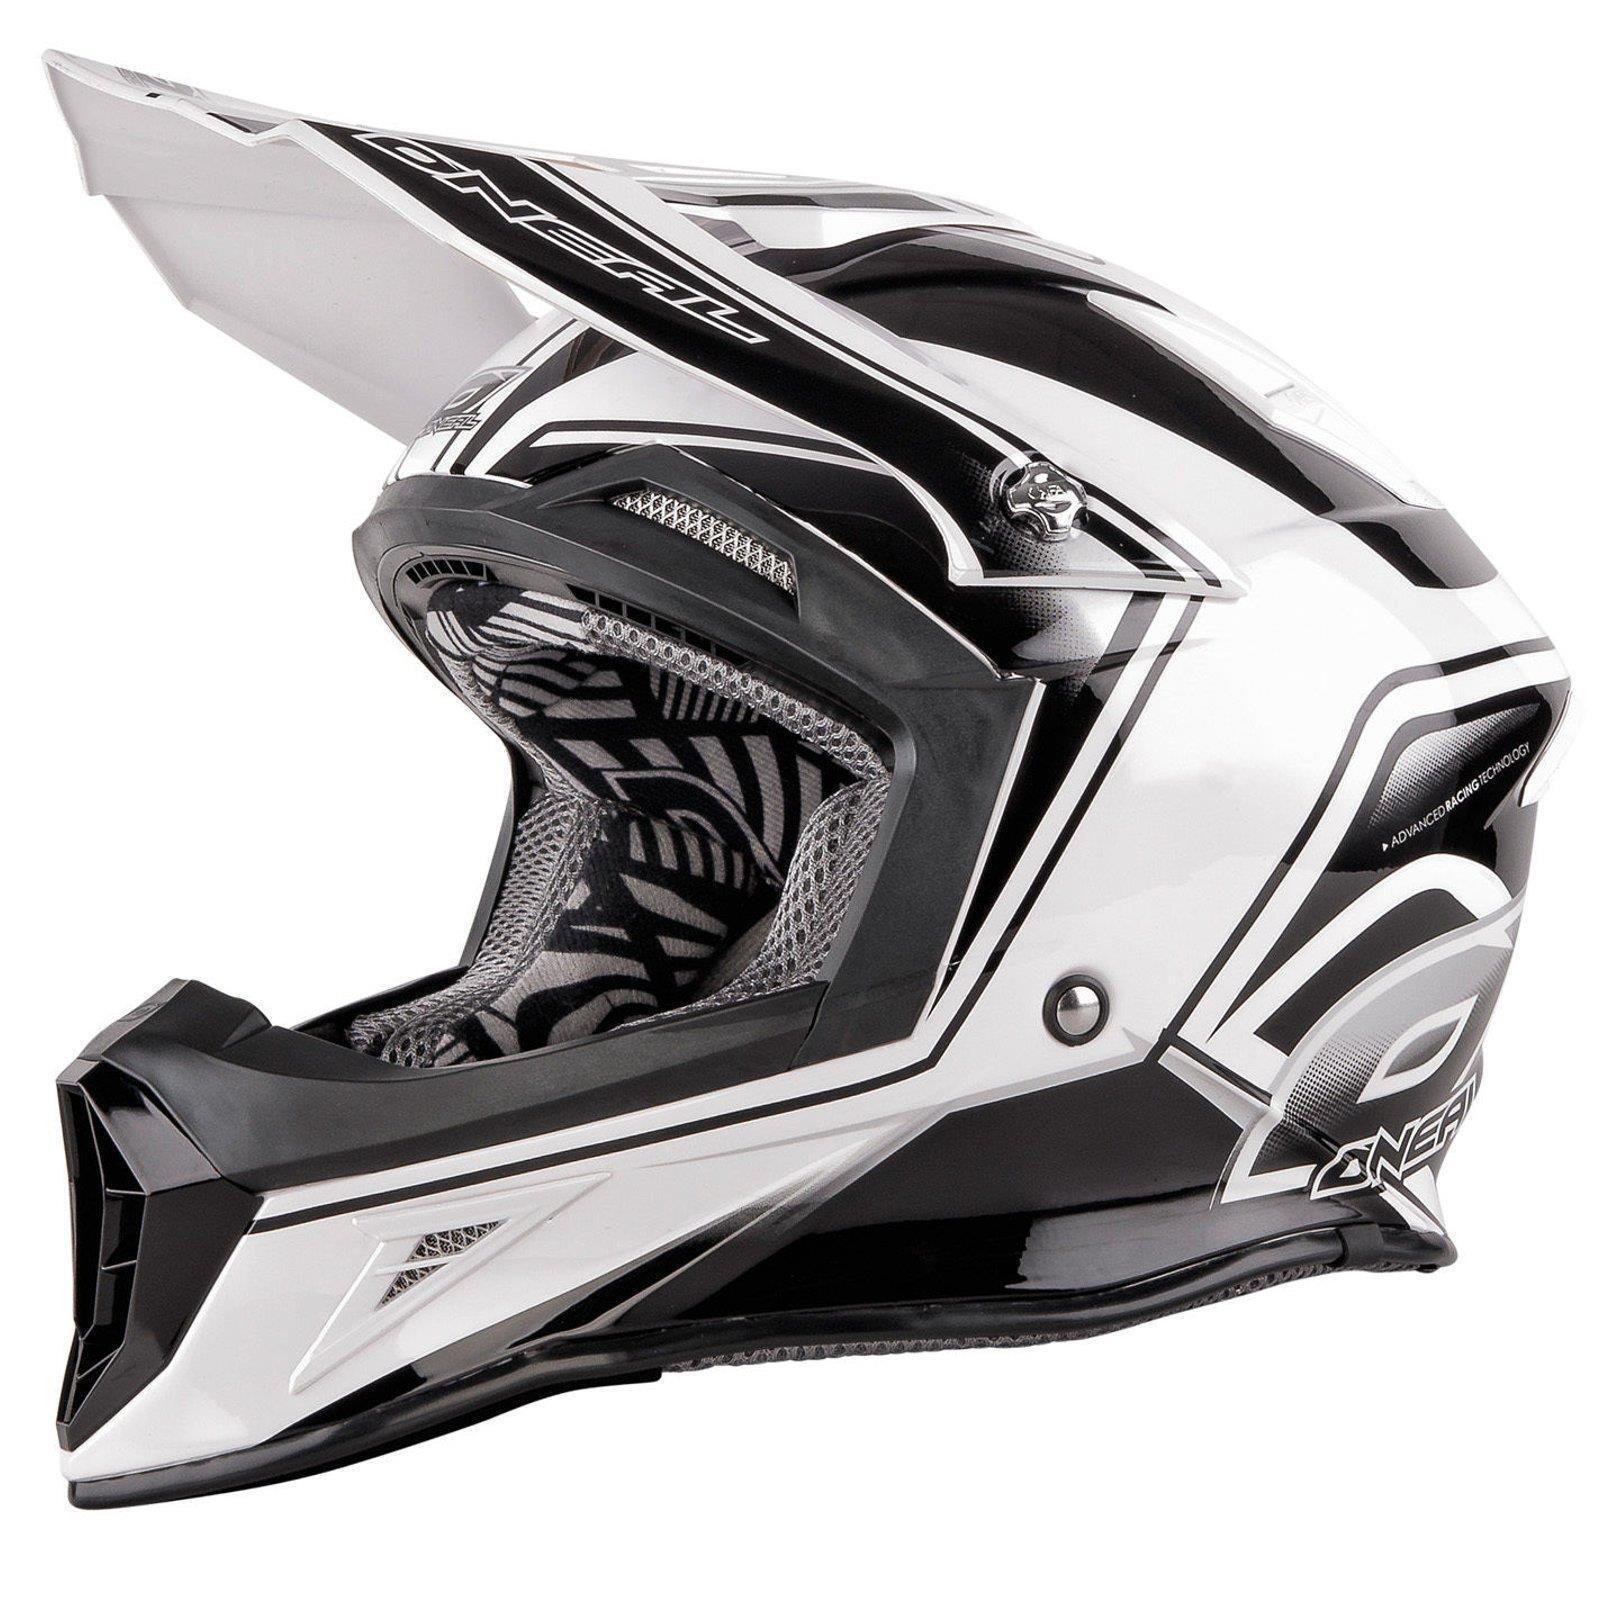 ONeal 10Series MX Helm Cahuilla Creek black weiss S Enduro Motocross Motorrad